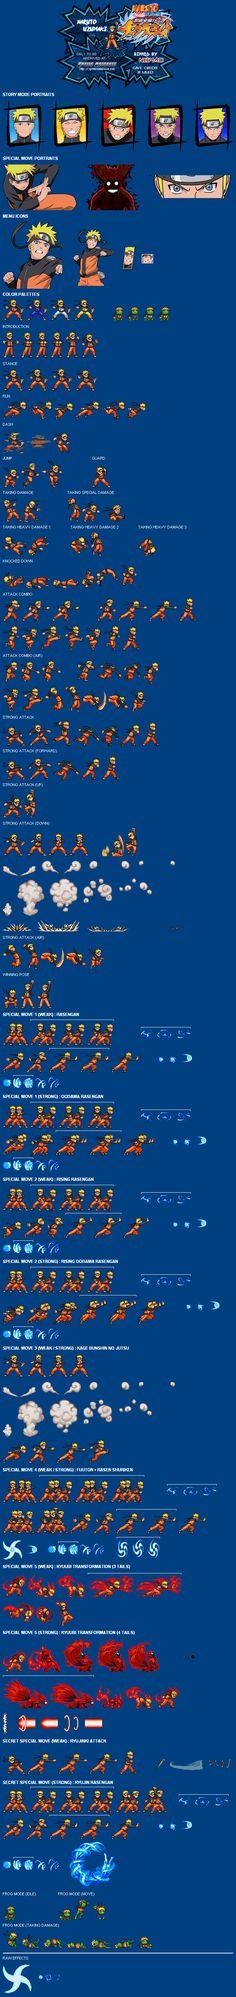 Sprite Database : Naruto